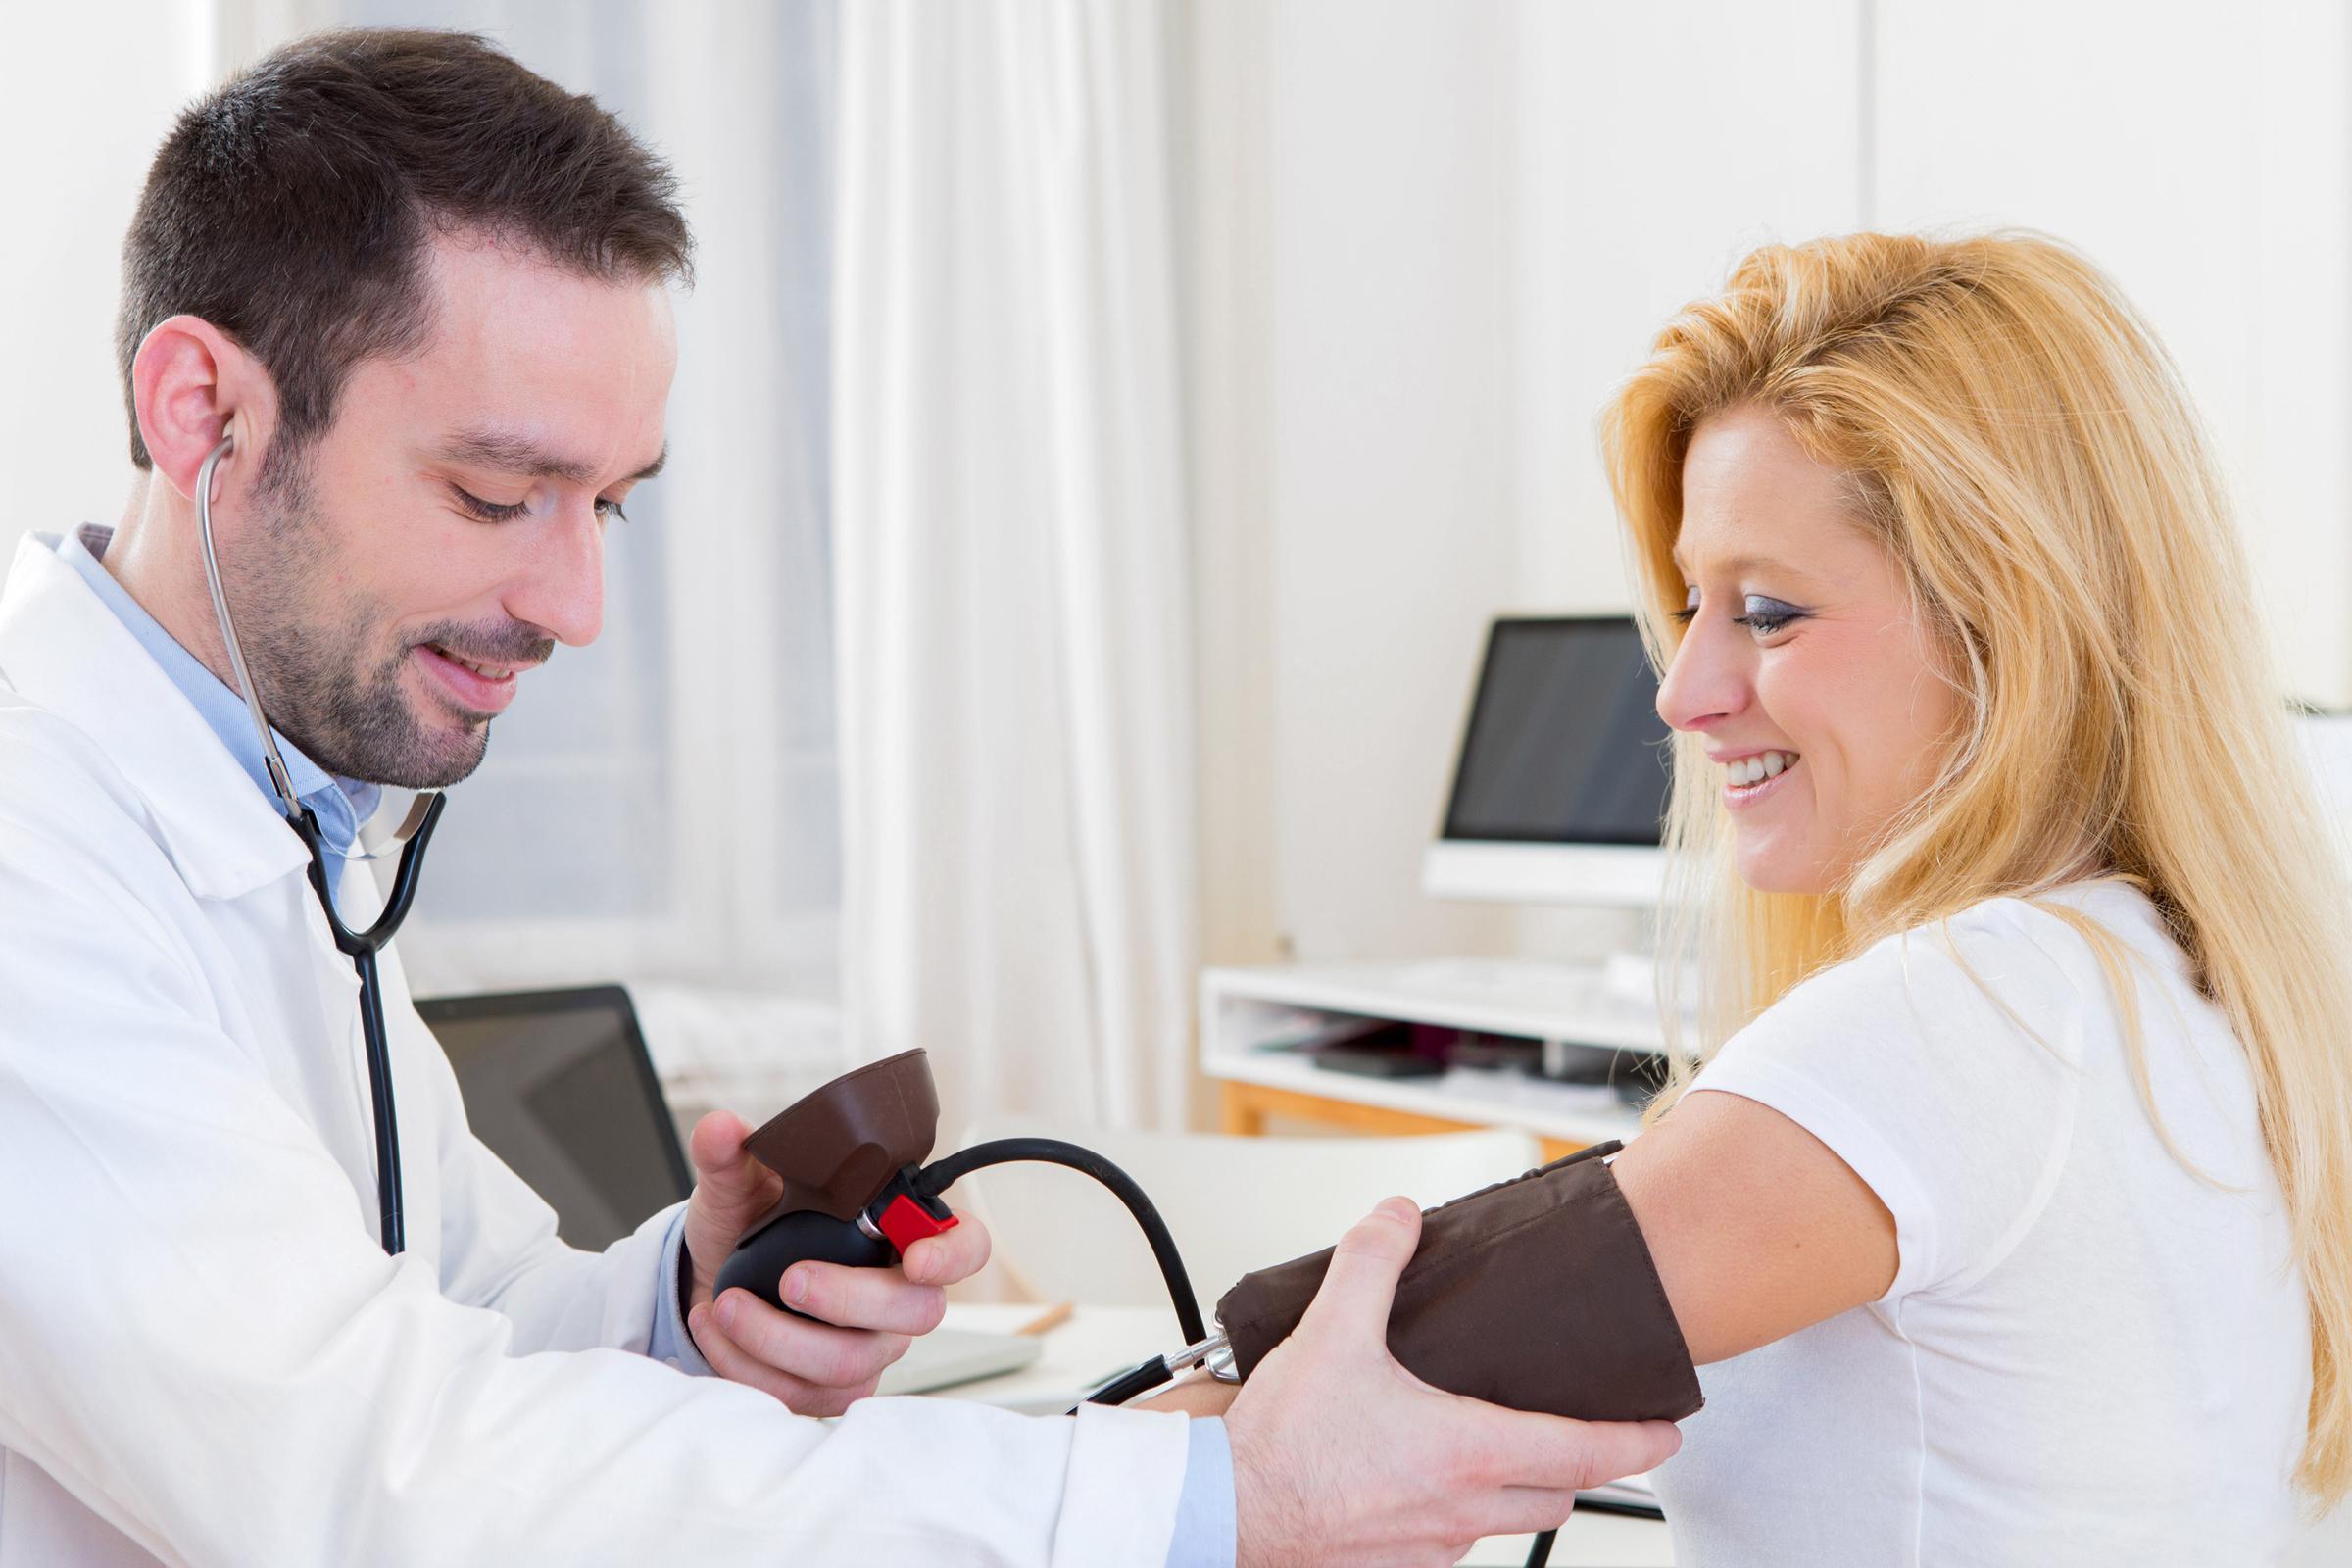 kardiológus ajánlásai magas vérnyomás esetén